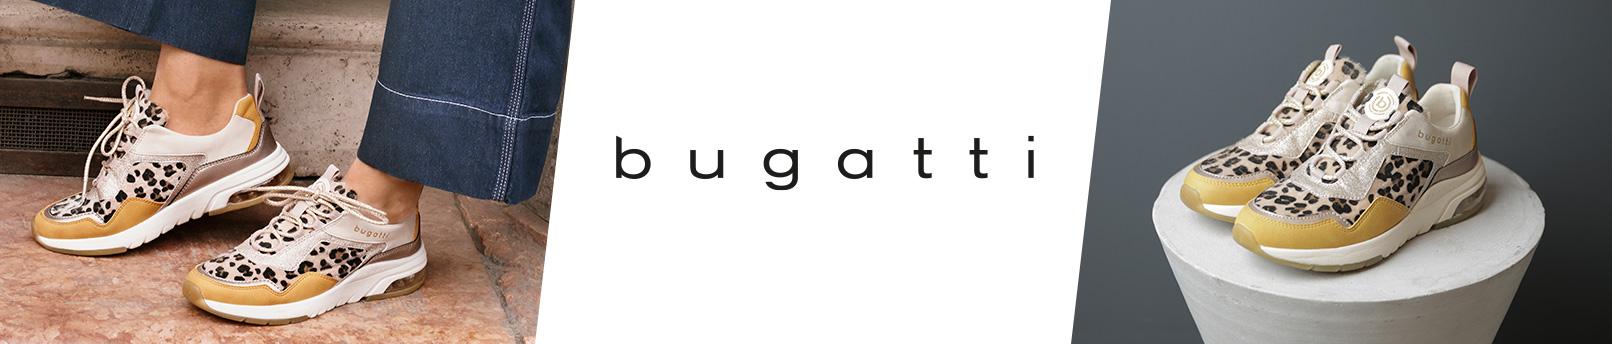 Bugatti shoppen